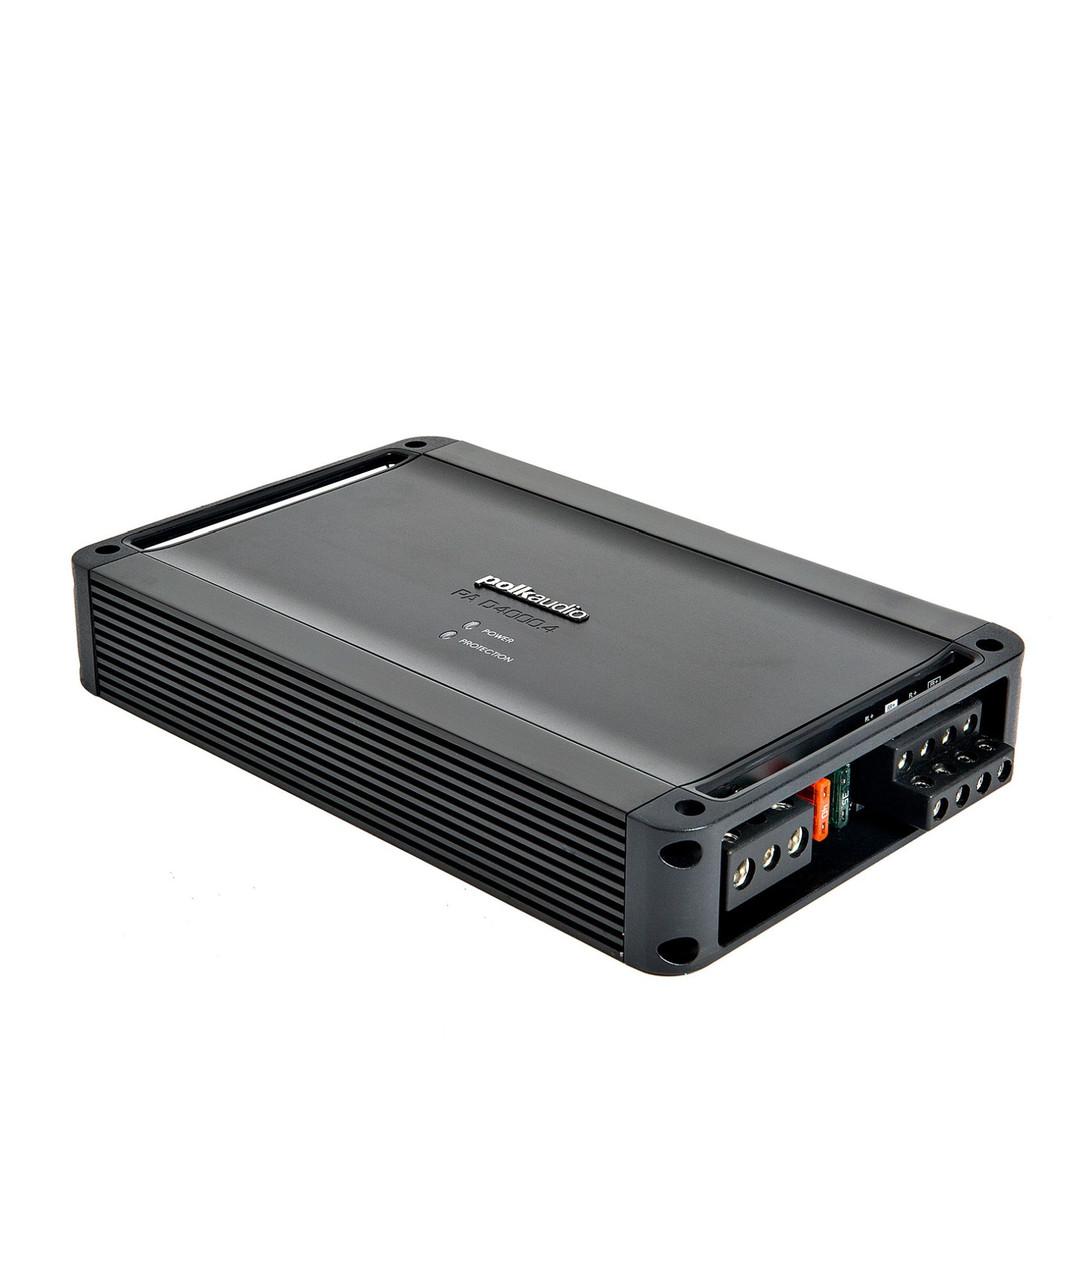 hight resolution of polk audio bundle a pair of db652 6 5 speakers a pair of db572 5x7 speakers pa d4000 4 amplifier wire kit creative audio